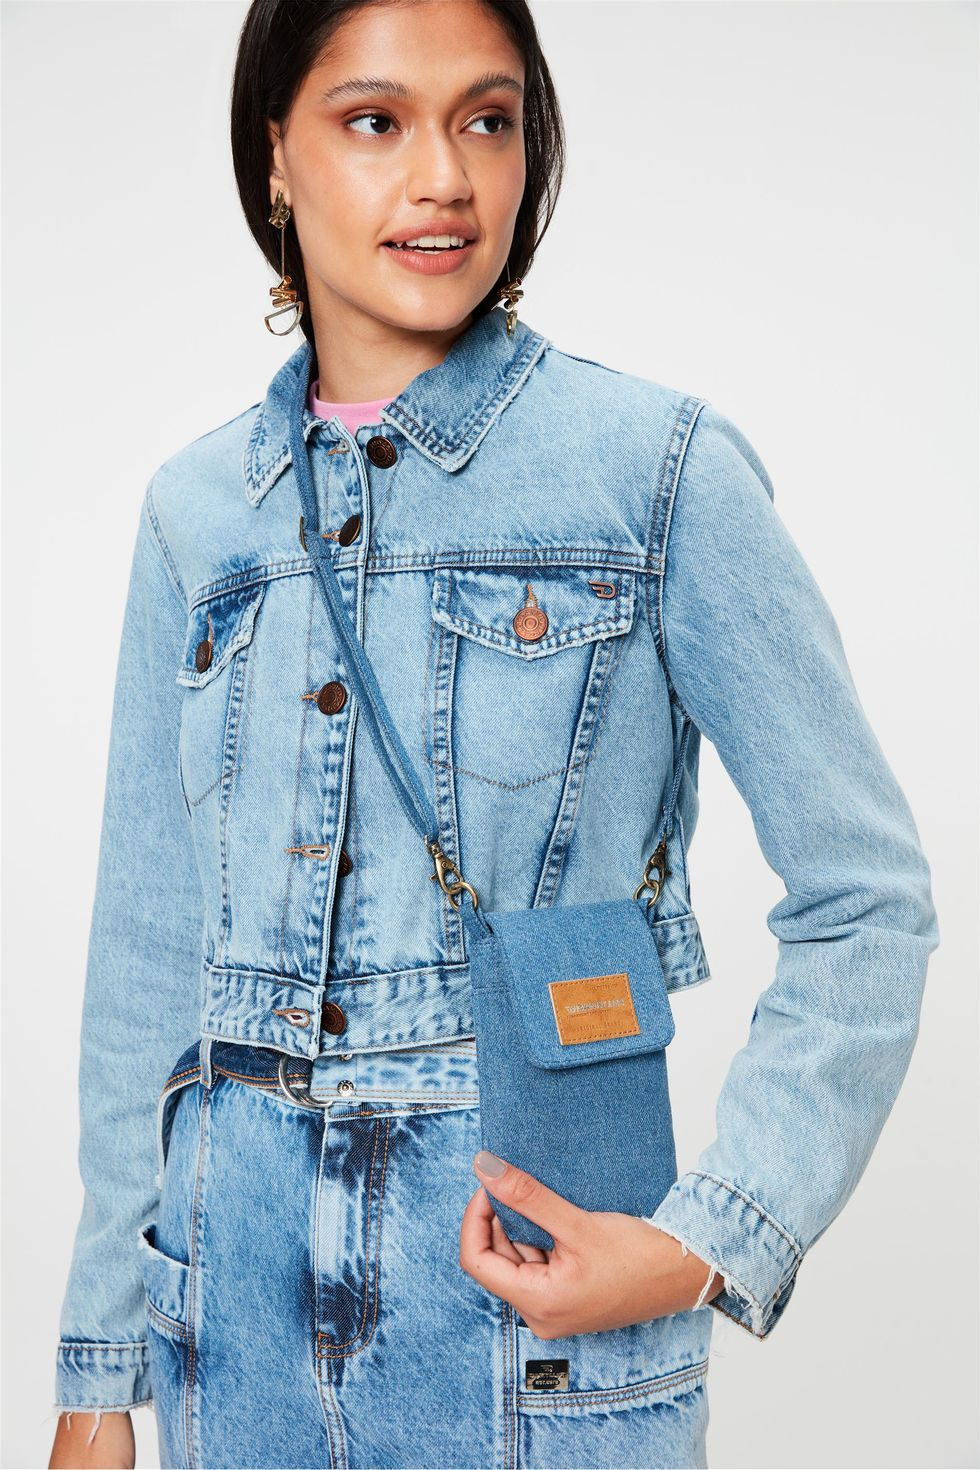 Bolsa-Mini-Jeans-Unissex-Frente--